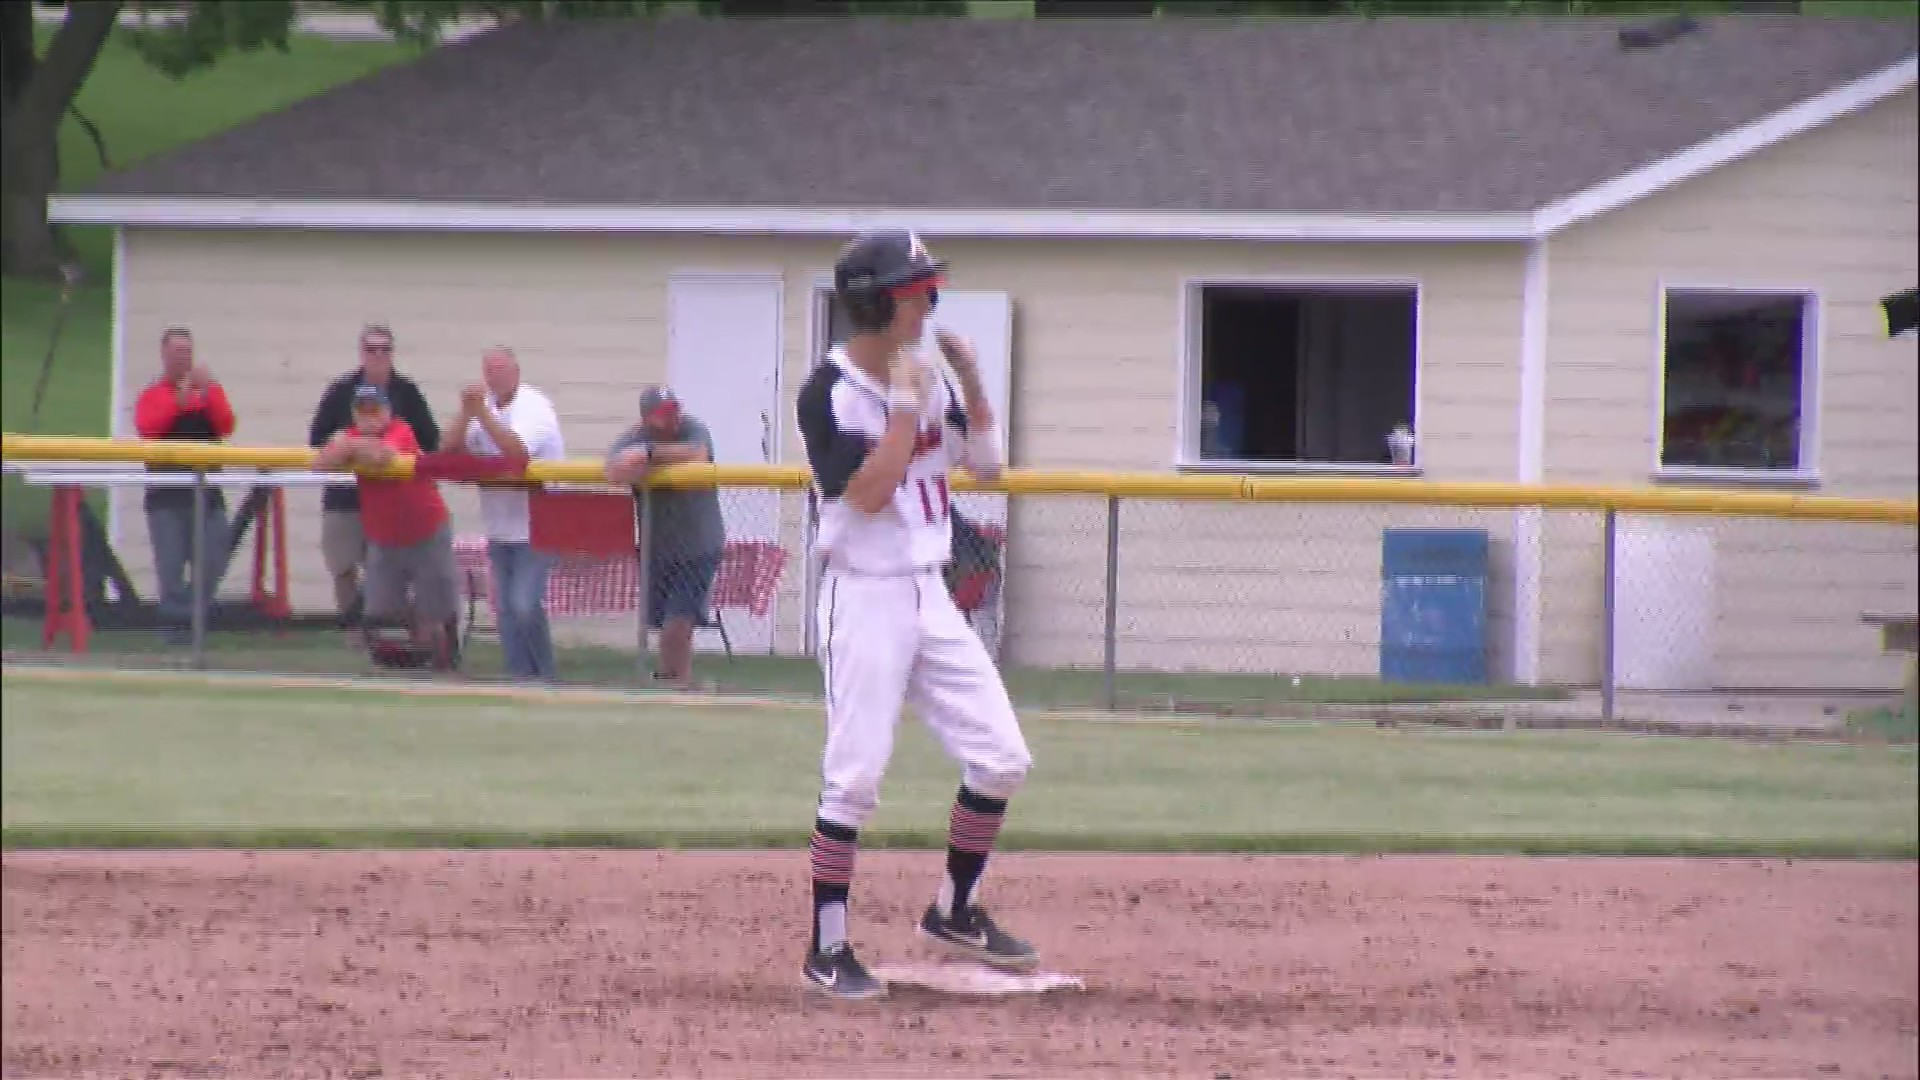 Assumption Baseball wins 2 against West on June 17.